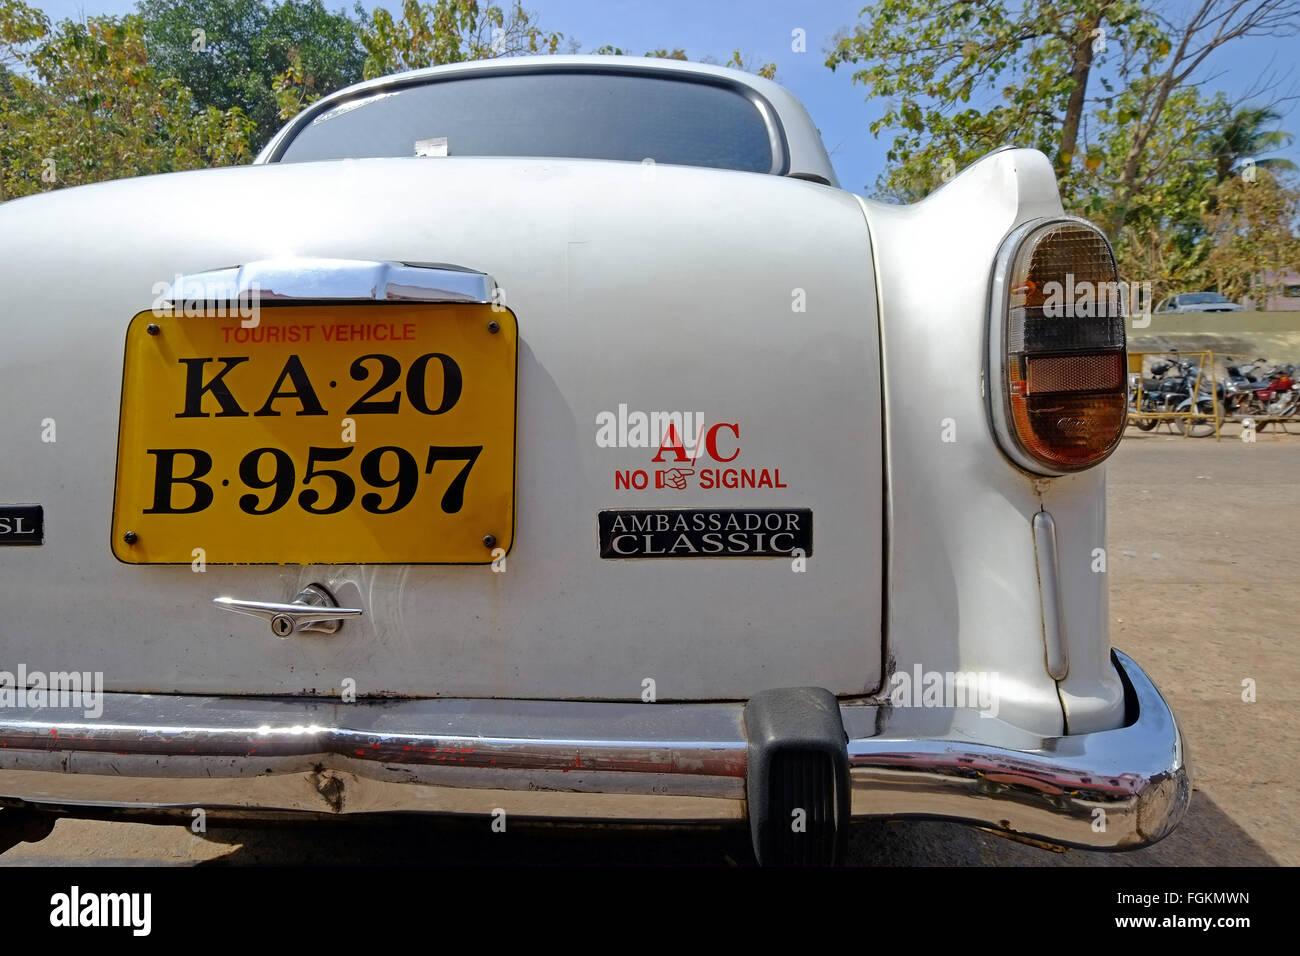 Railway Motor Car Stock Photos & Railway Motor Car Stock